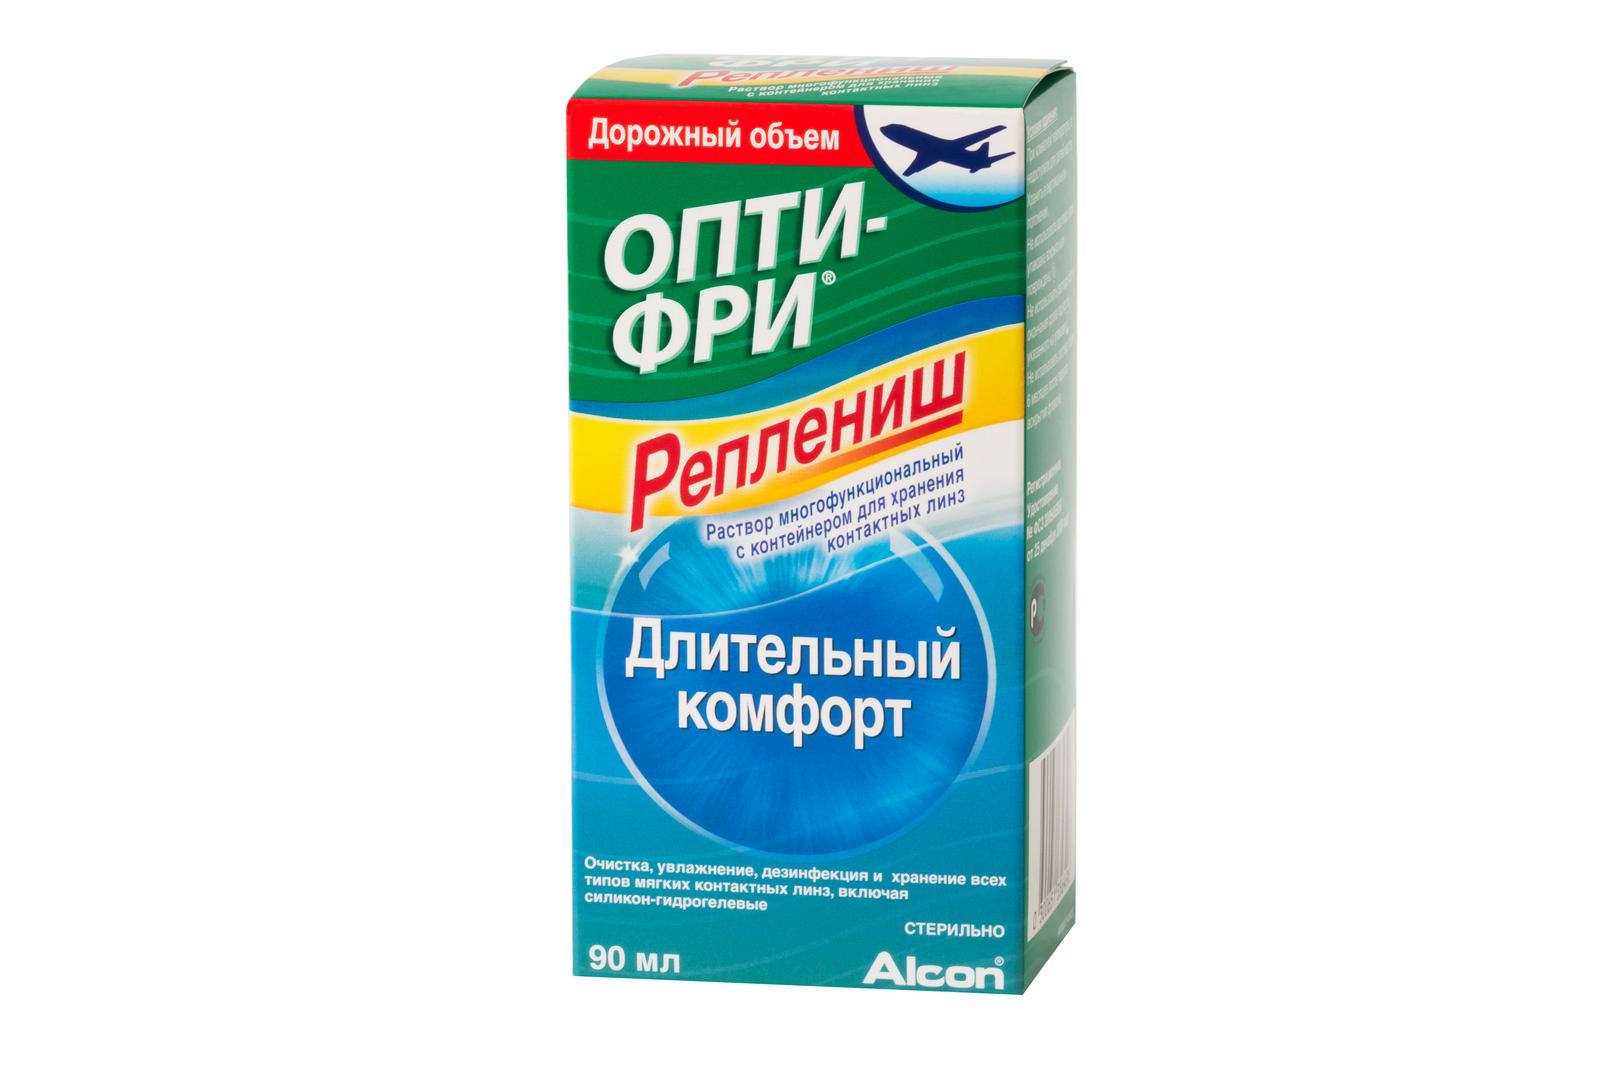 Купить Раствор Опти-Фри Реплениш 90 мл, Opti-Free